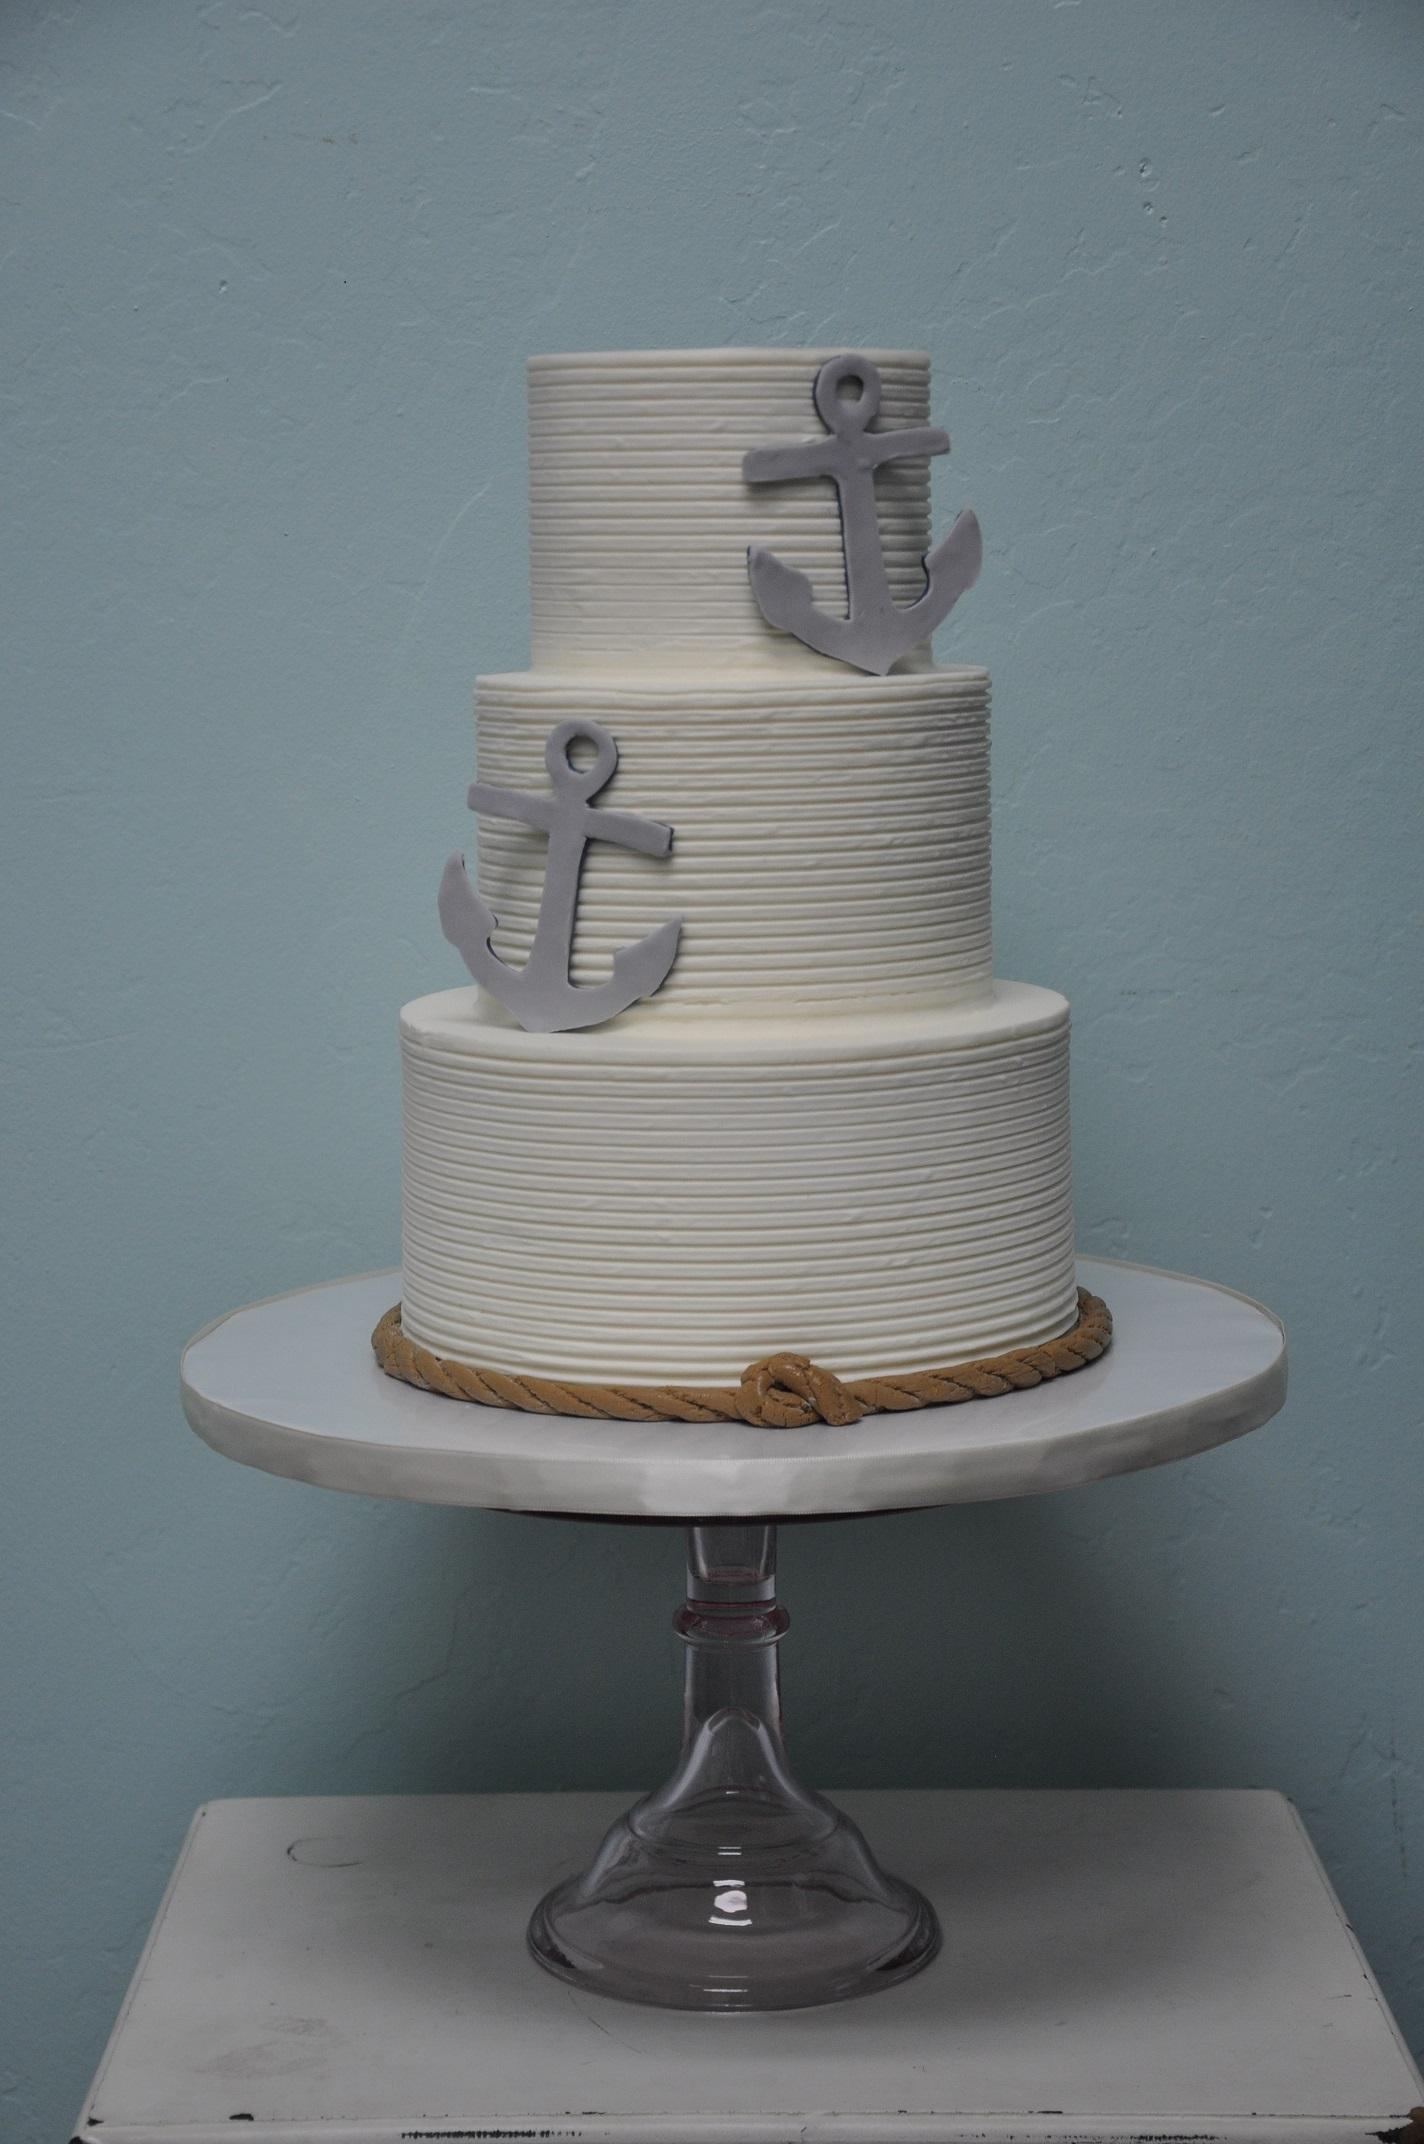 combed-nautical-theme-wedding-cake-edible-anchors-rope